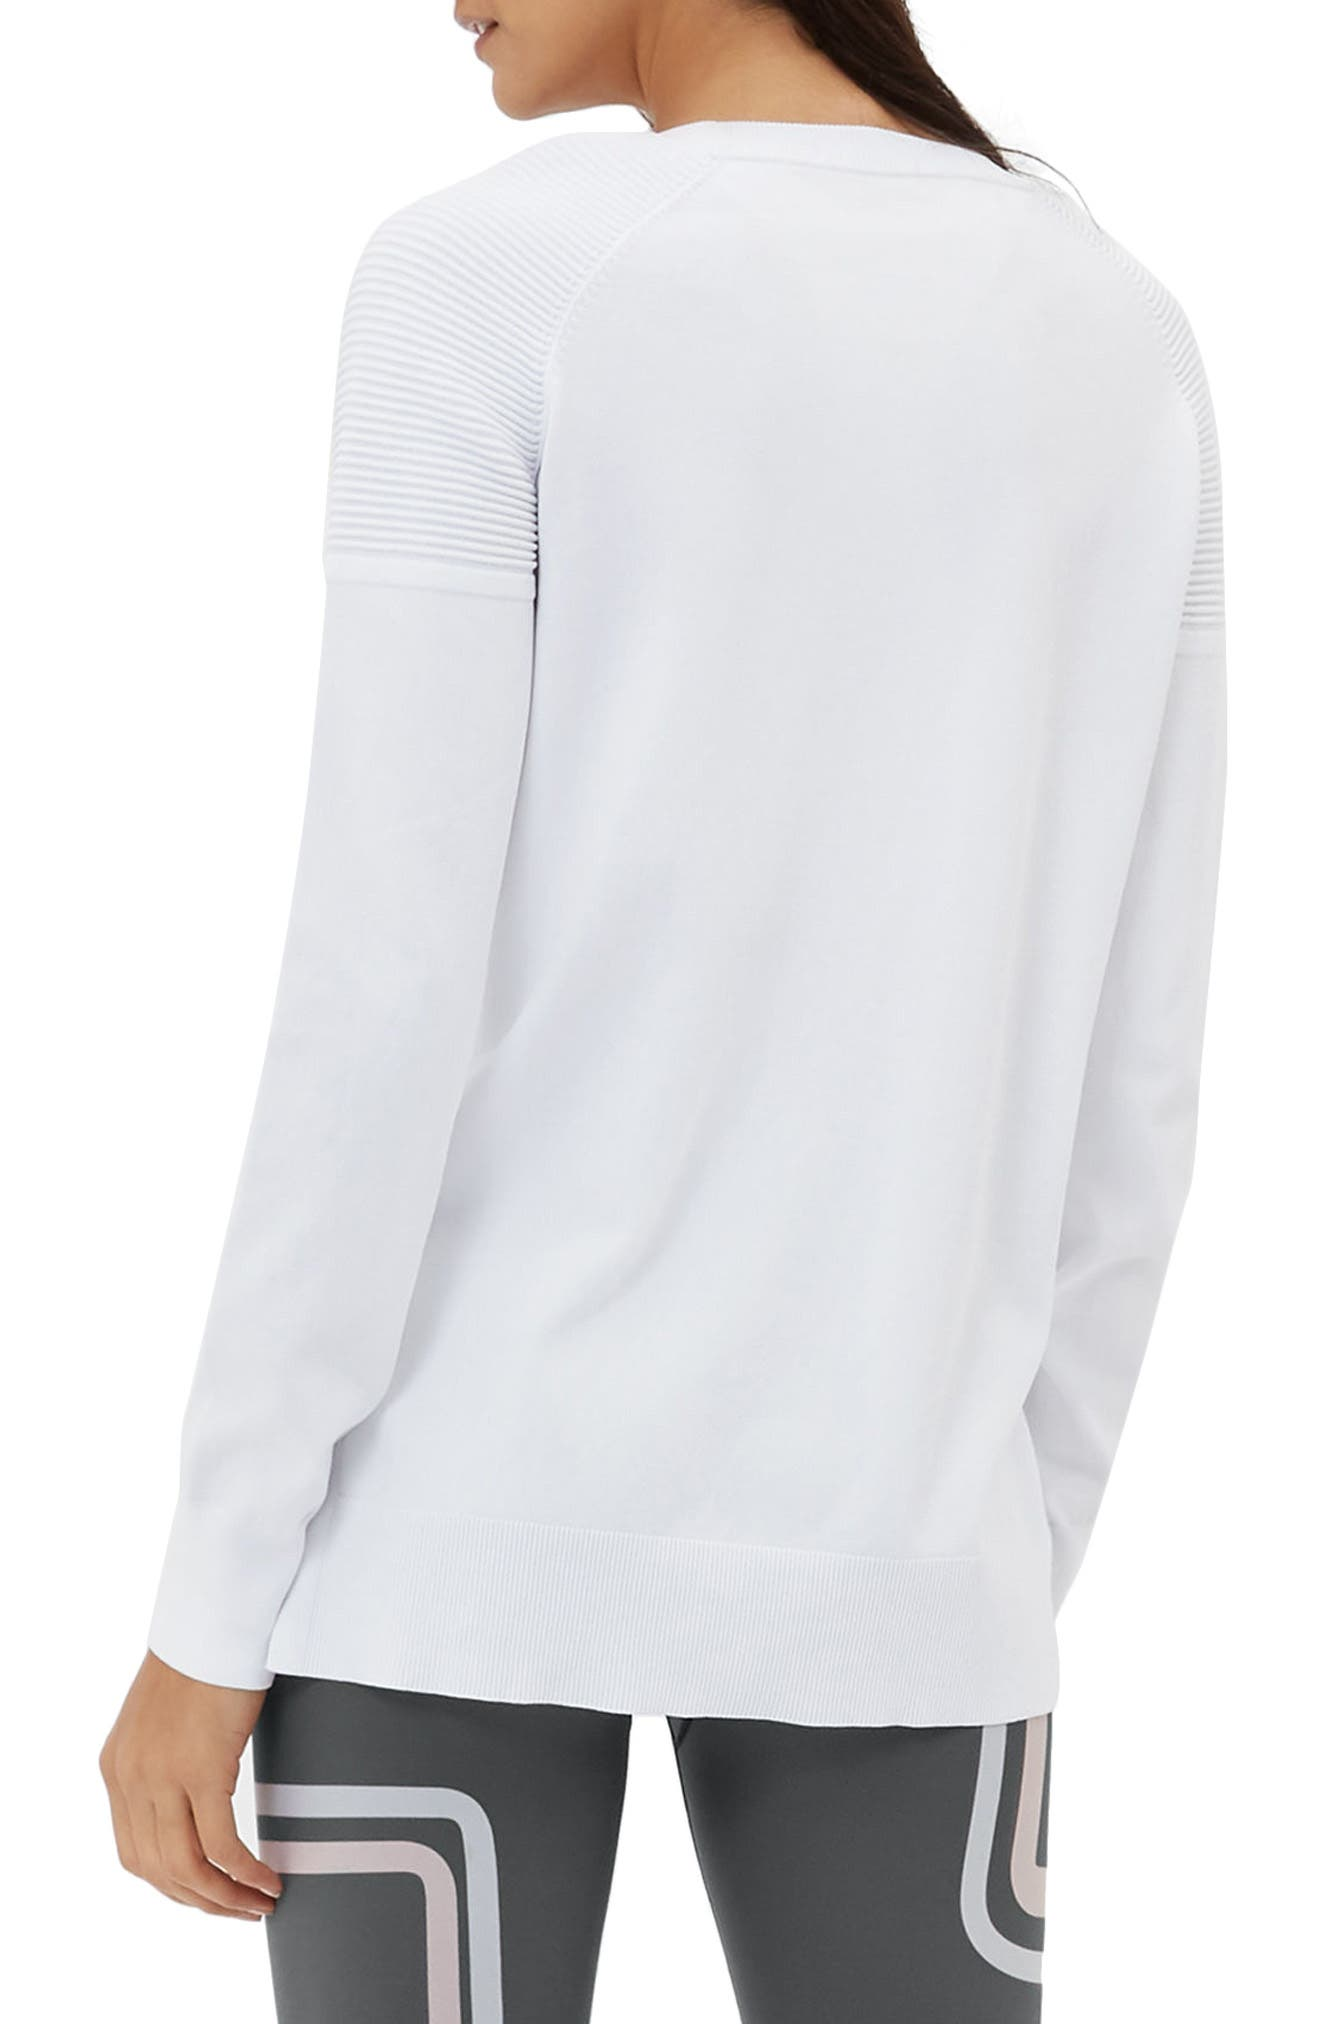 8 Track Sweatshirt,                             Alternate thumbnail 2, color,                             White